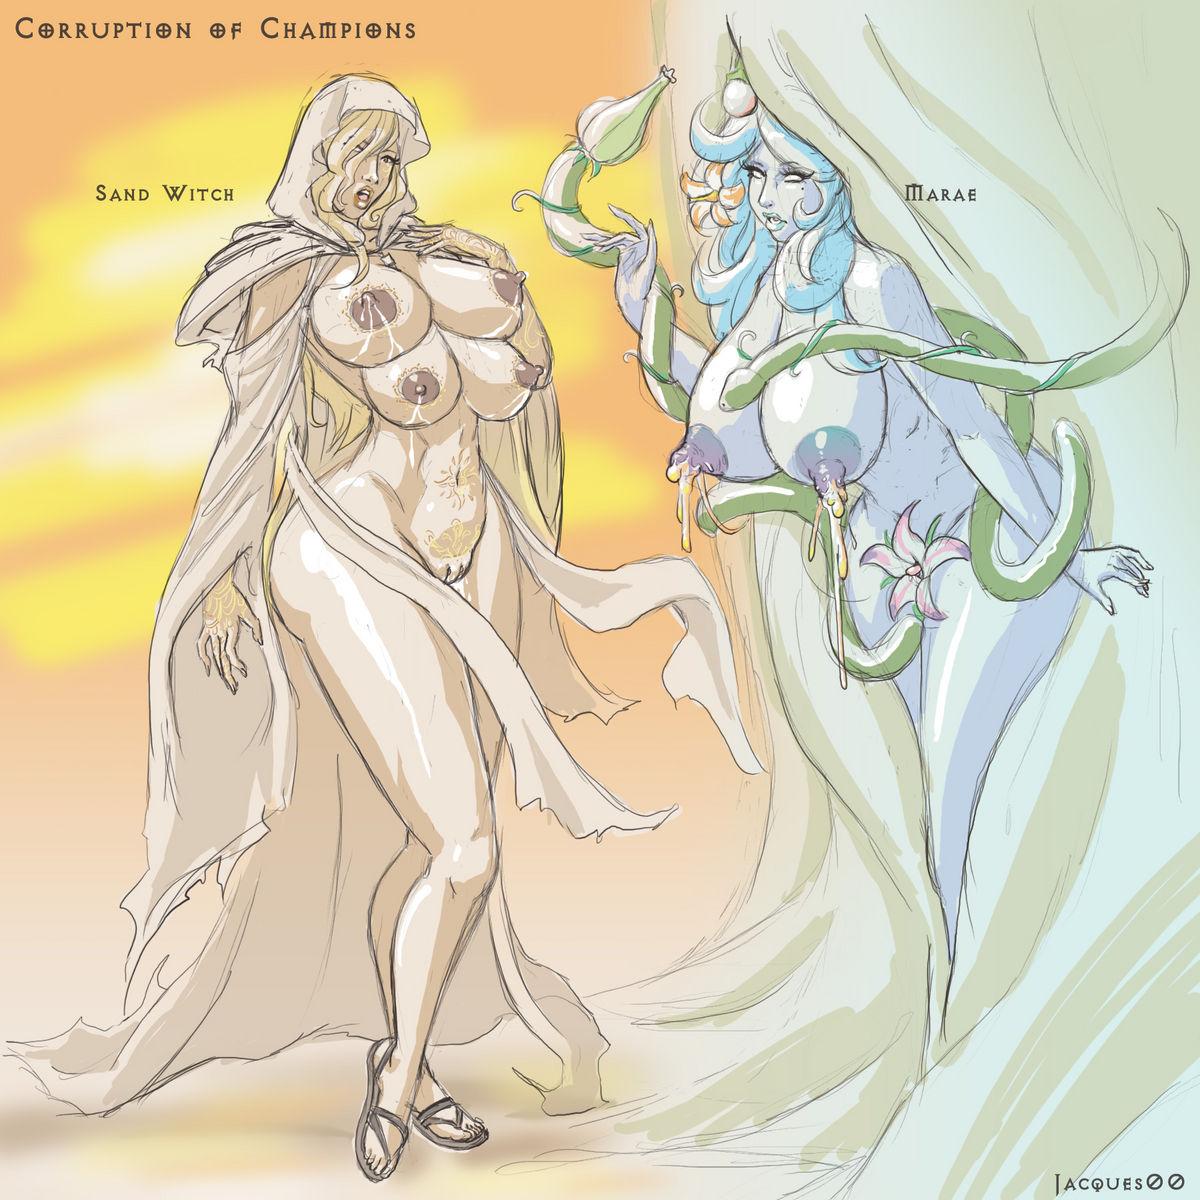 dragon of champions corruption egg Is nekopara censored on steam